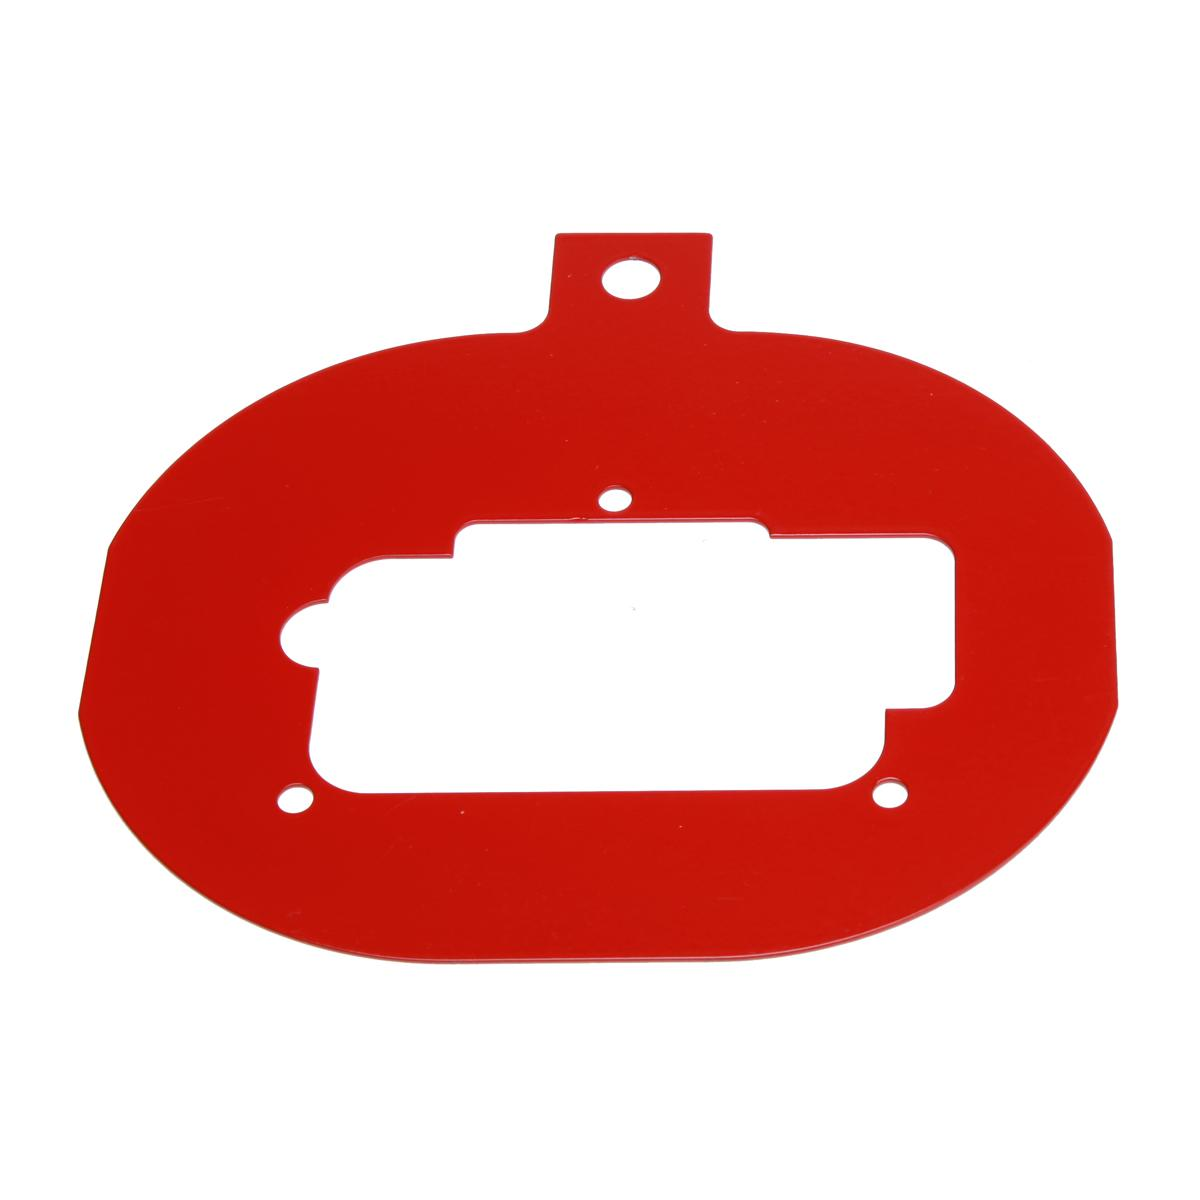 Itg jc20 baseplate 7jc20 from merlin motorsport for Motor base plate design